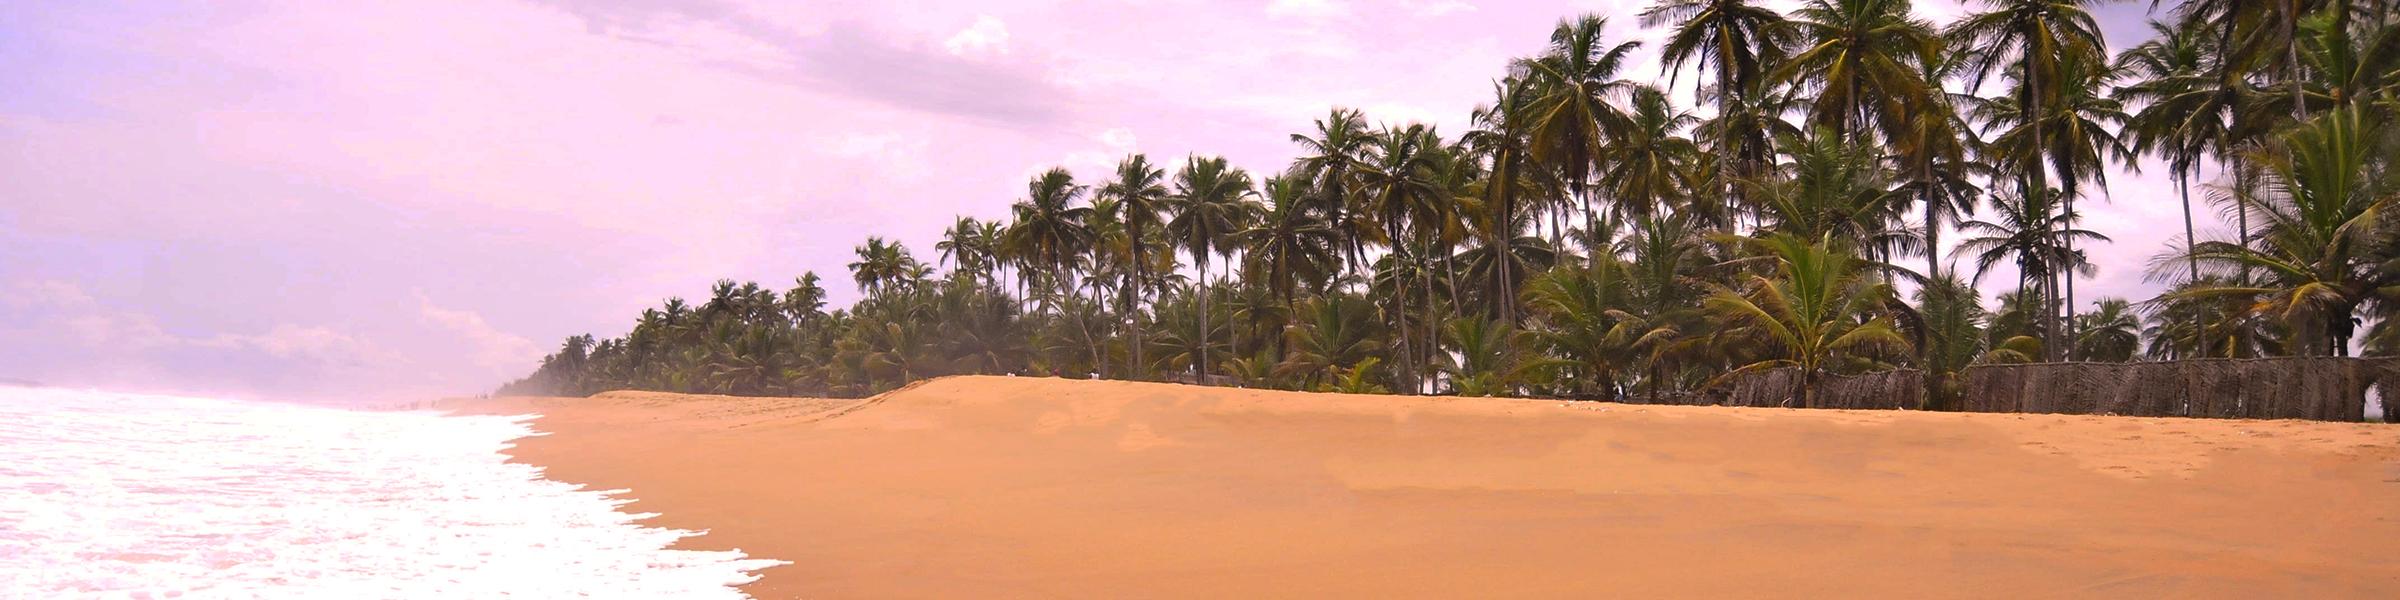 Ivory Coast GrandBassam